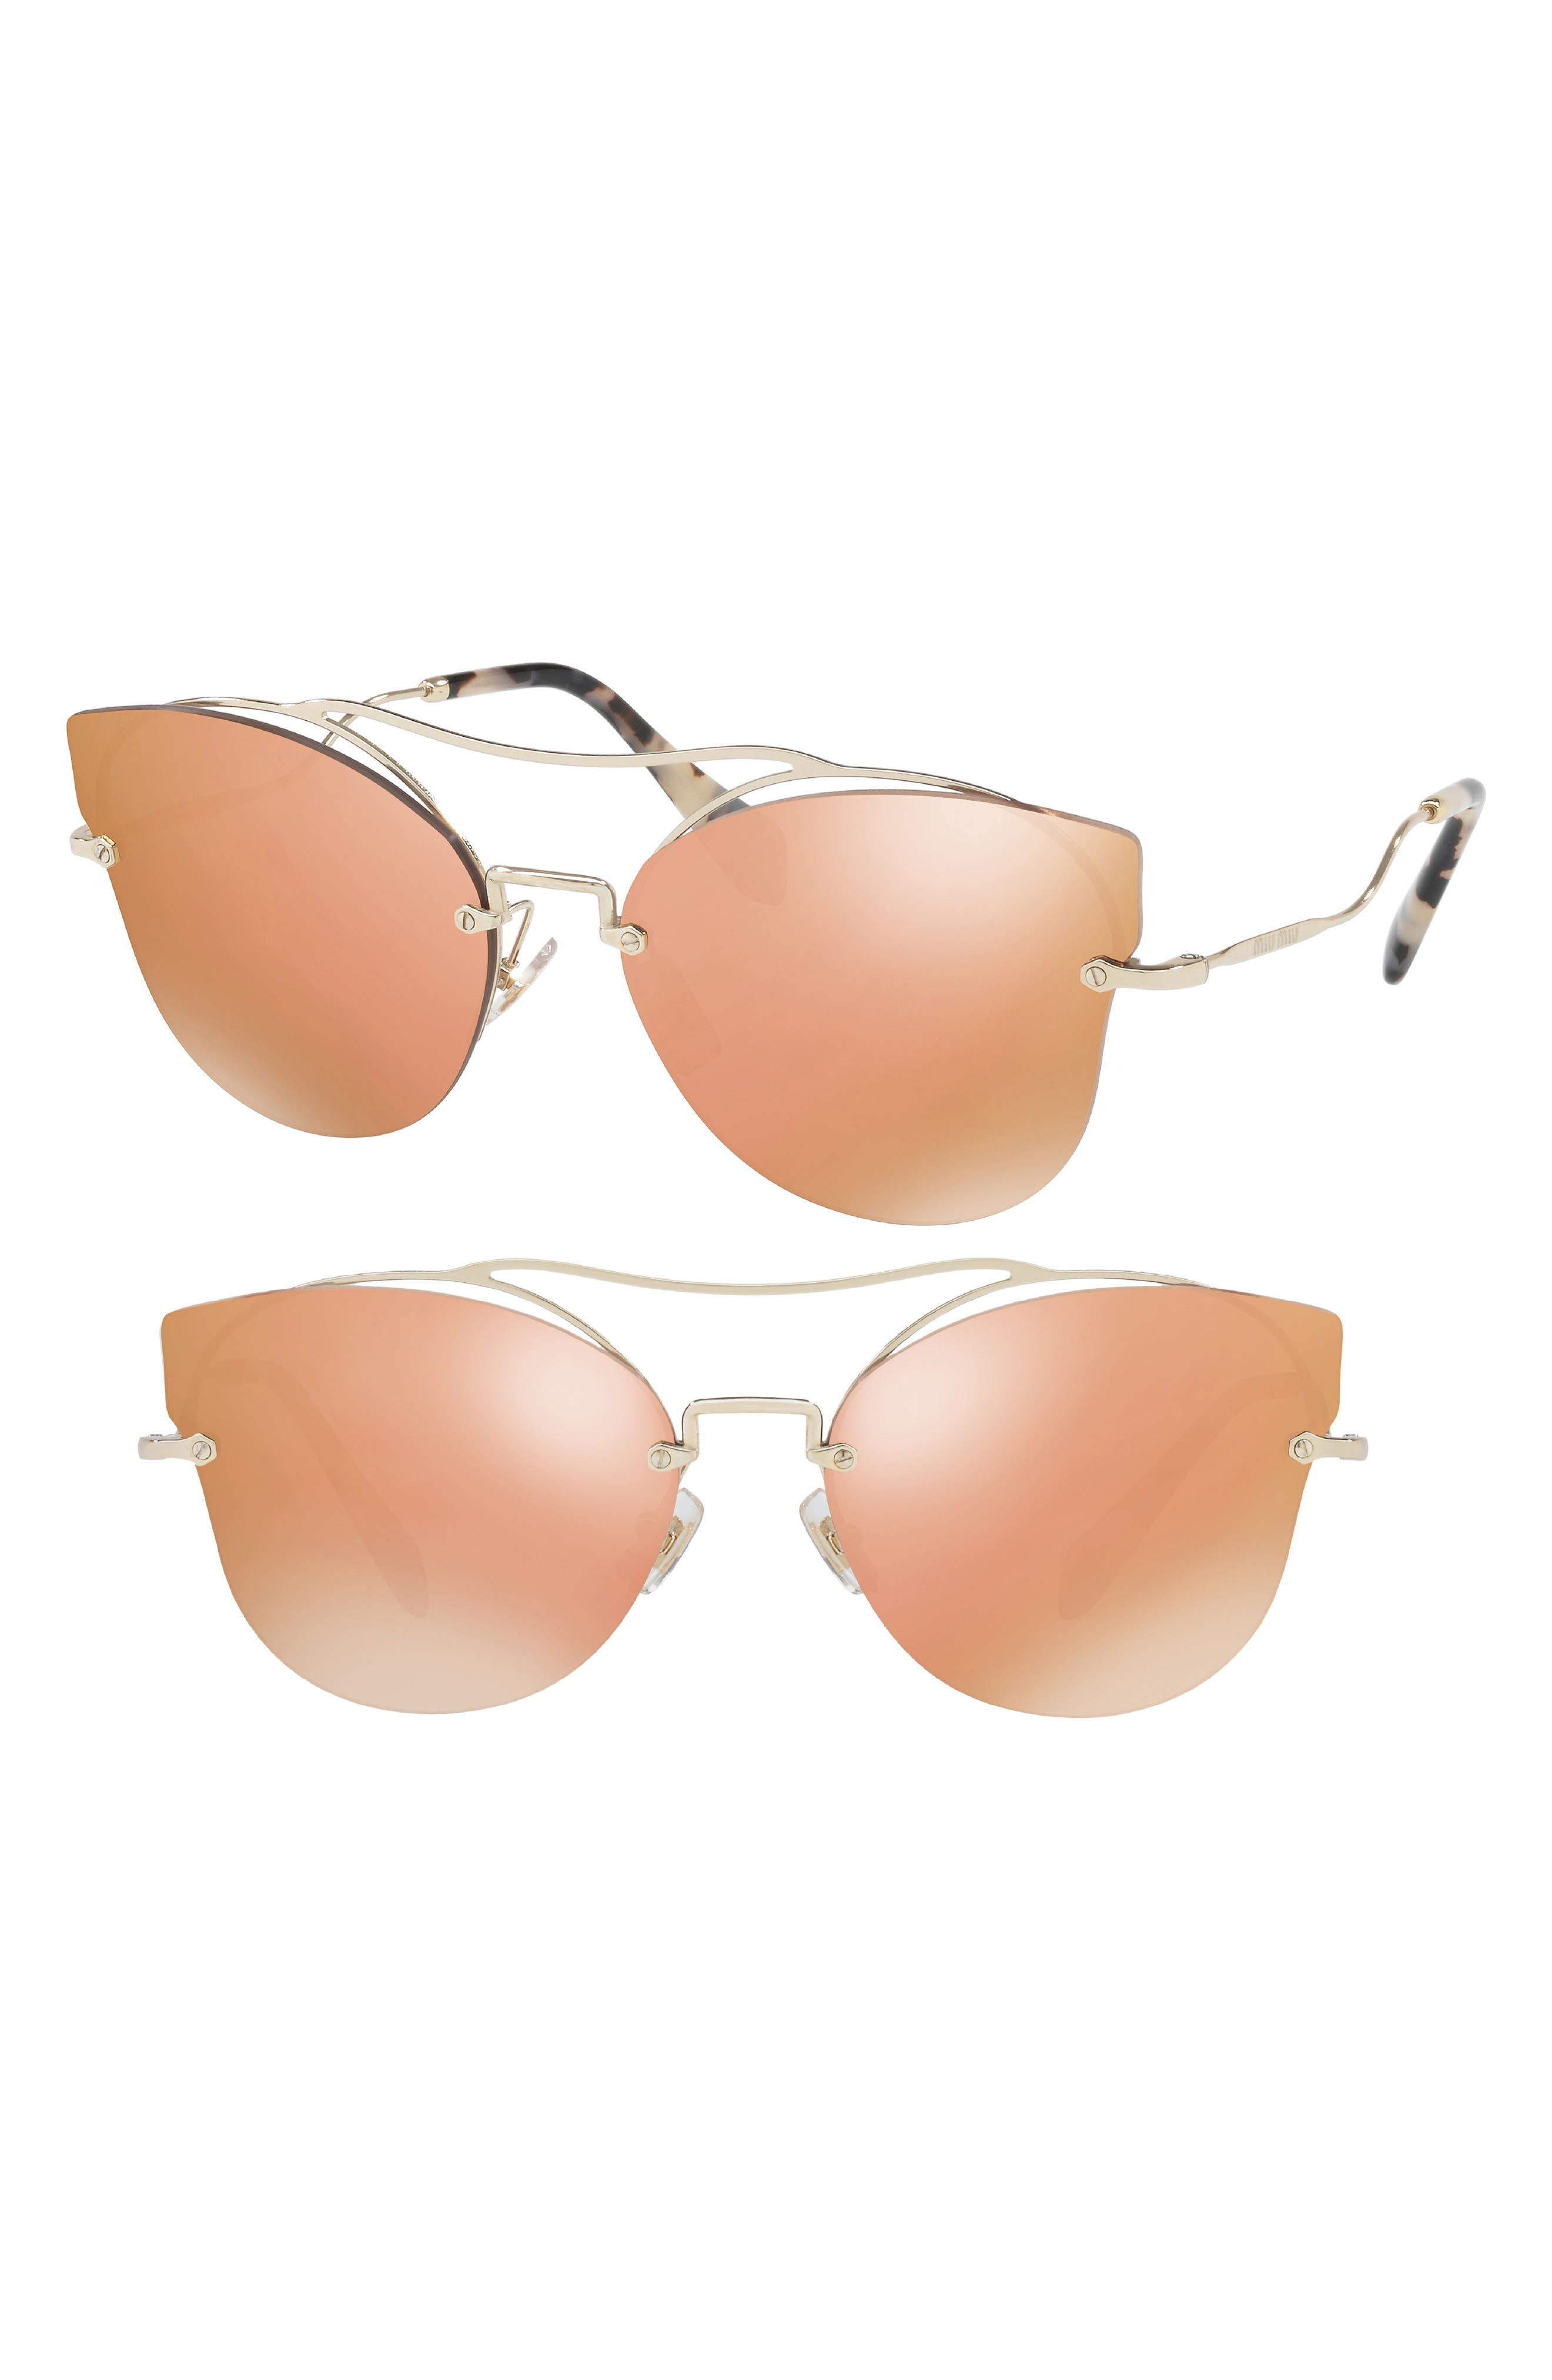 62mm Aviator Sunglasses,                             Main thumbnail 1, color,                             Gold/ Pink Mirror